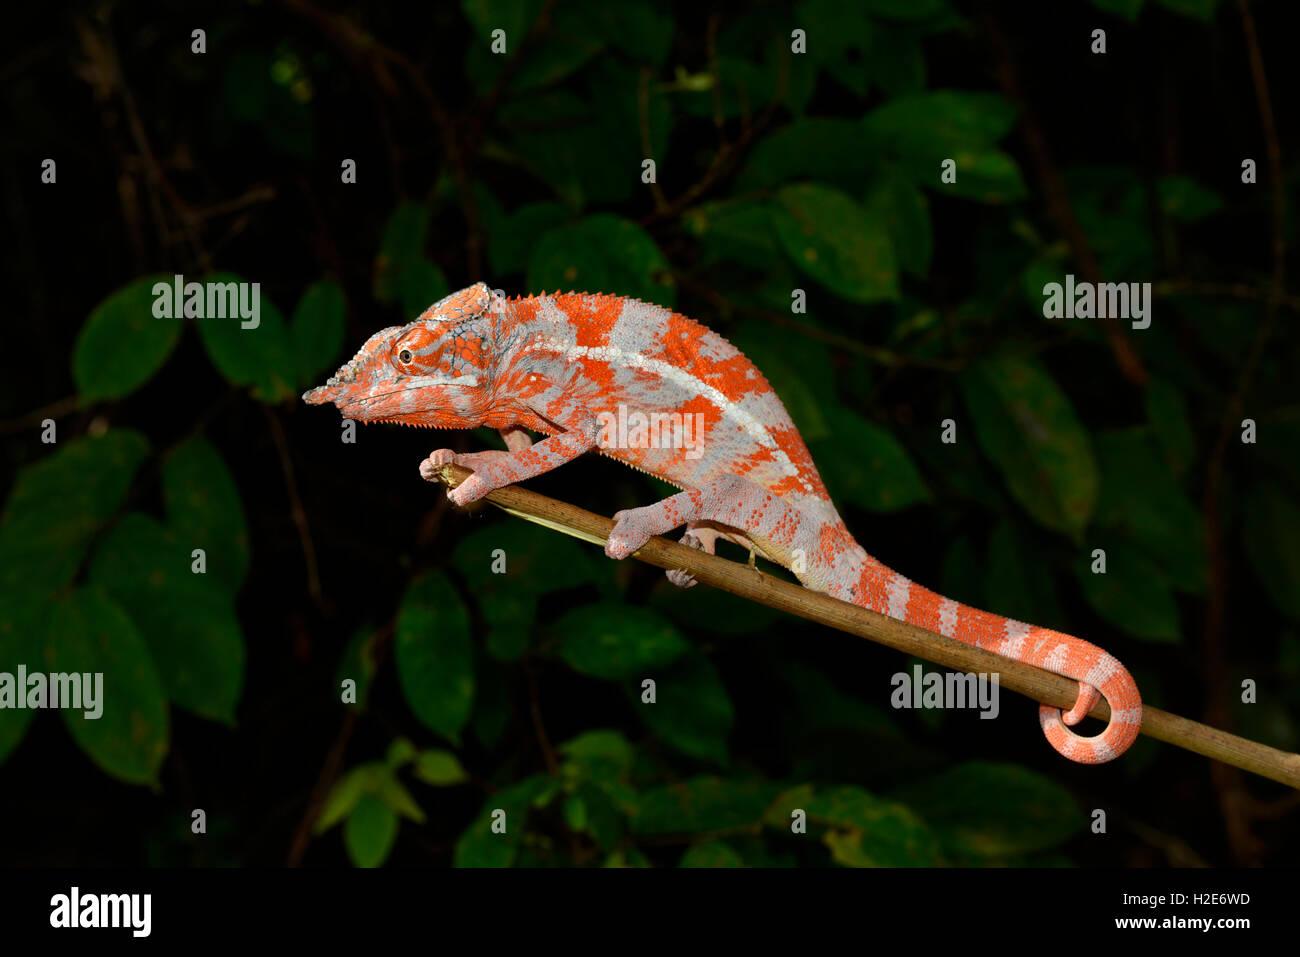 Angel's chameleon (Furcifer angeli), dry forest, northwestern Madagascar - Stock Image